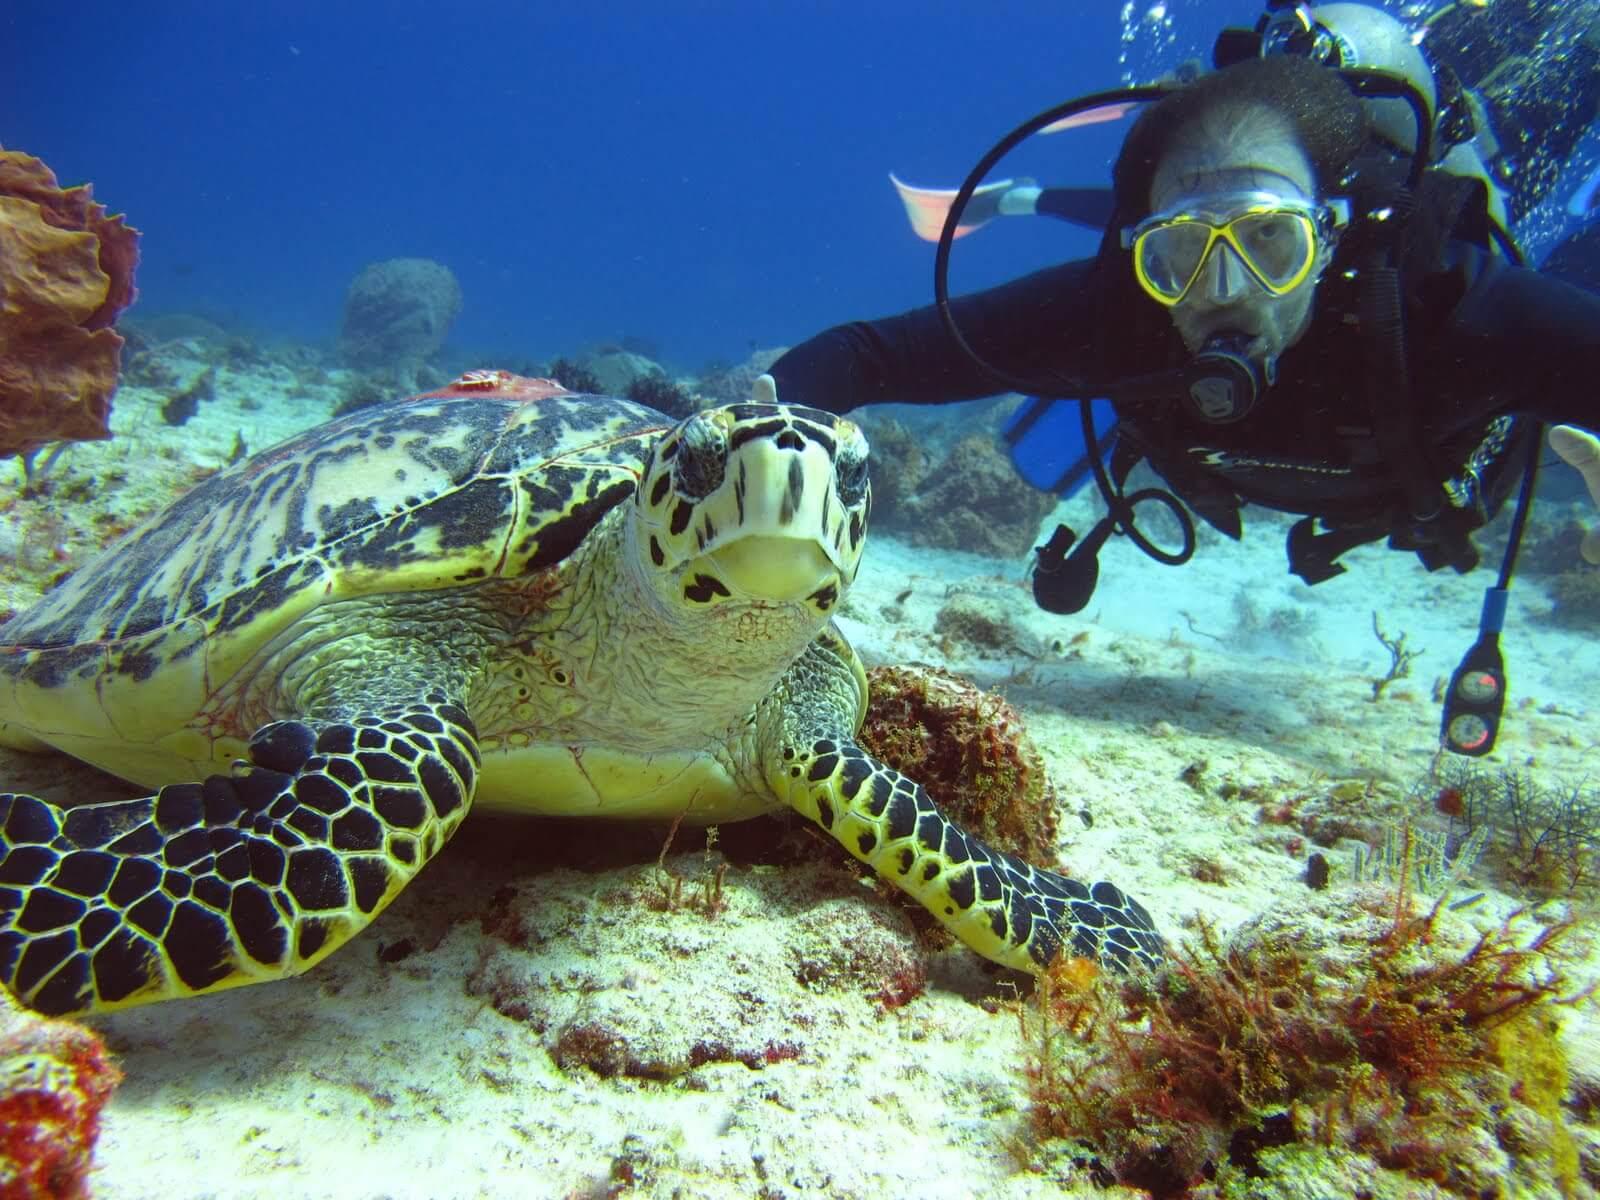 Mesoamerican-Coral-reef-Ocean-Scuba-Diving-30